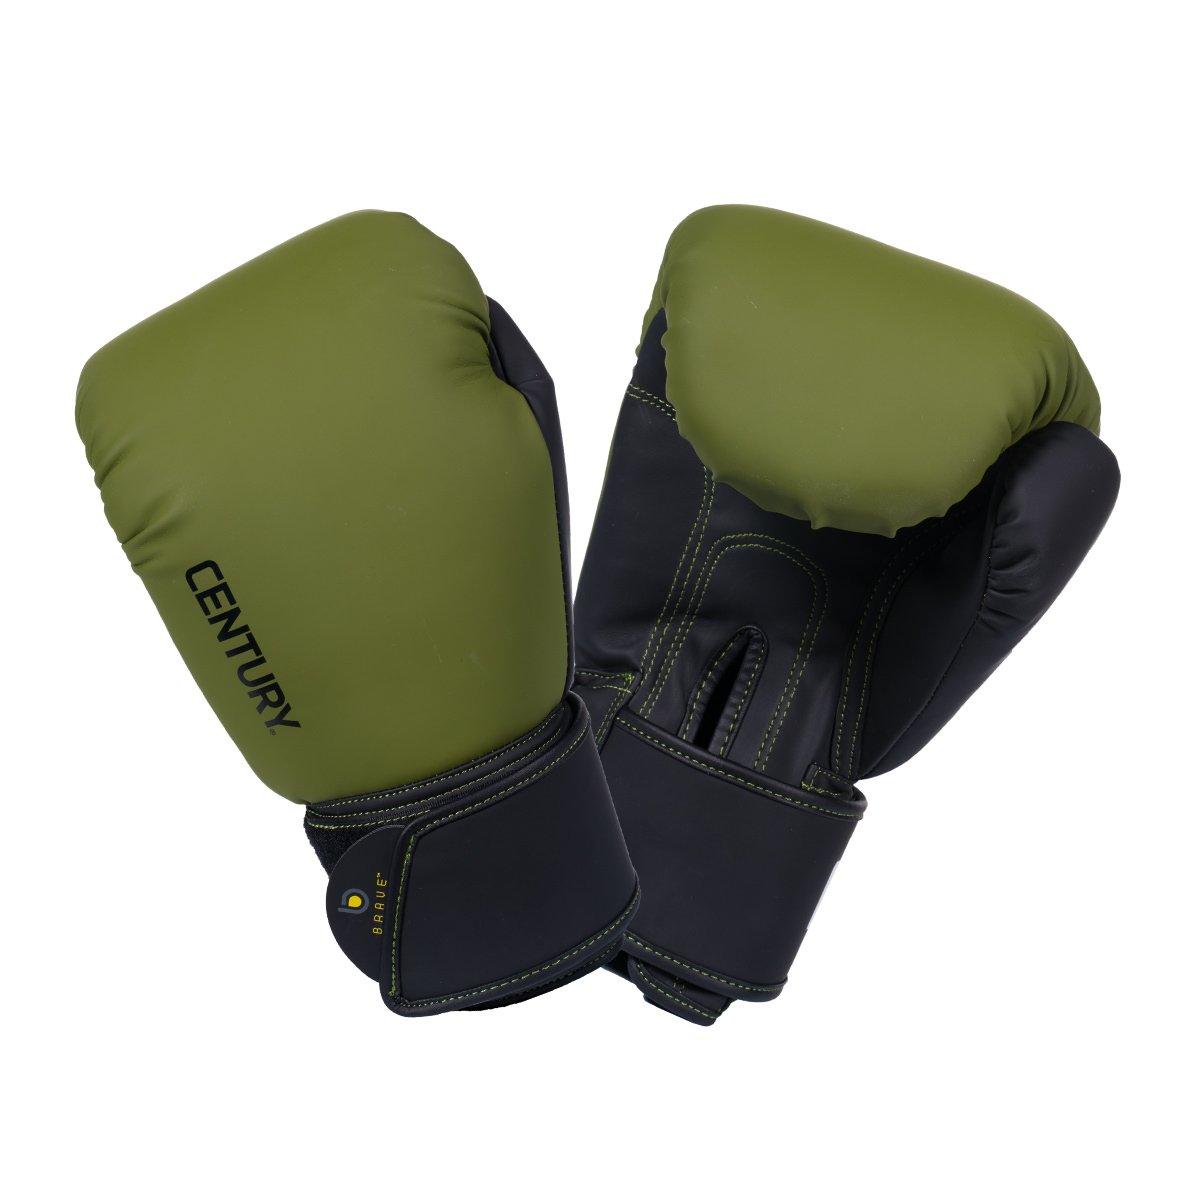 Century Brave Muay Thai Boxing Glove 12oz Olive//Black